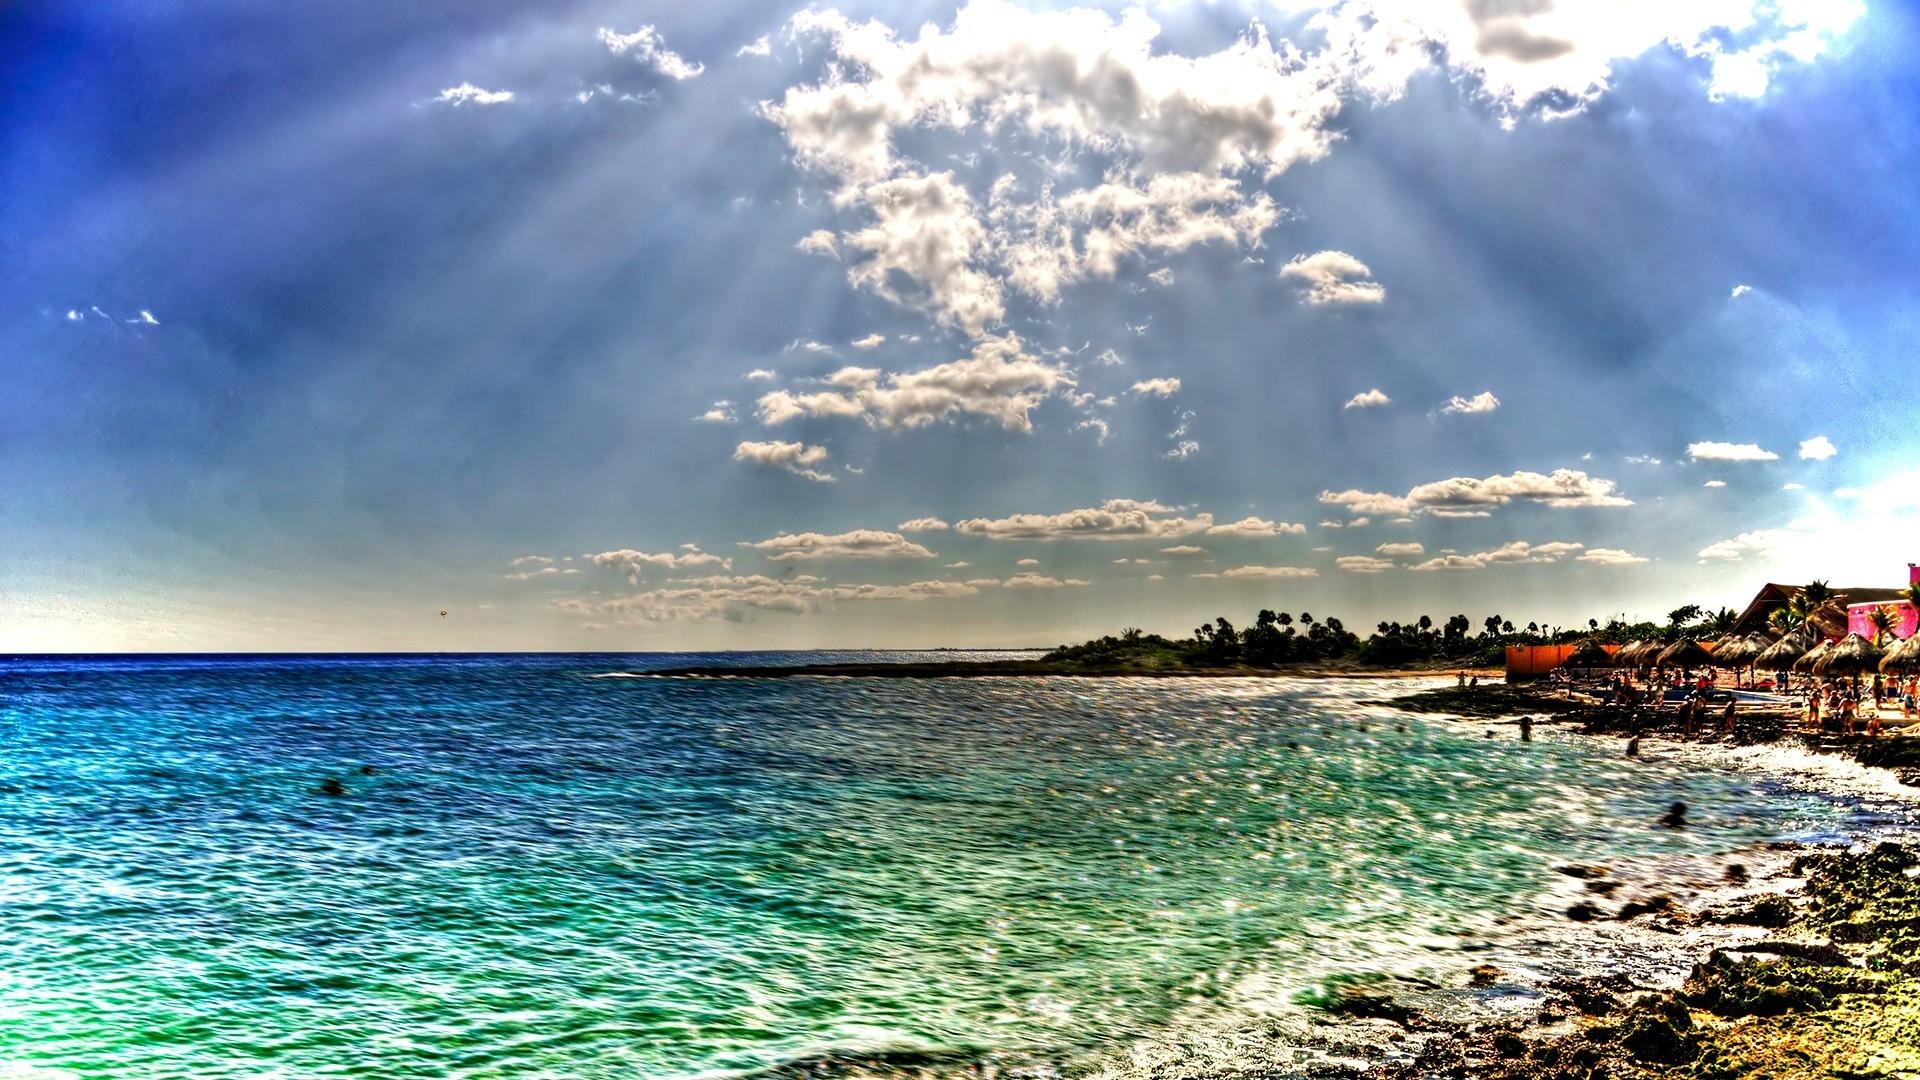 Download Wallpaper 1920x1080 Beach Sea Sun Beams Colors Coast